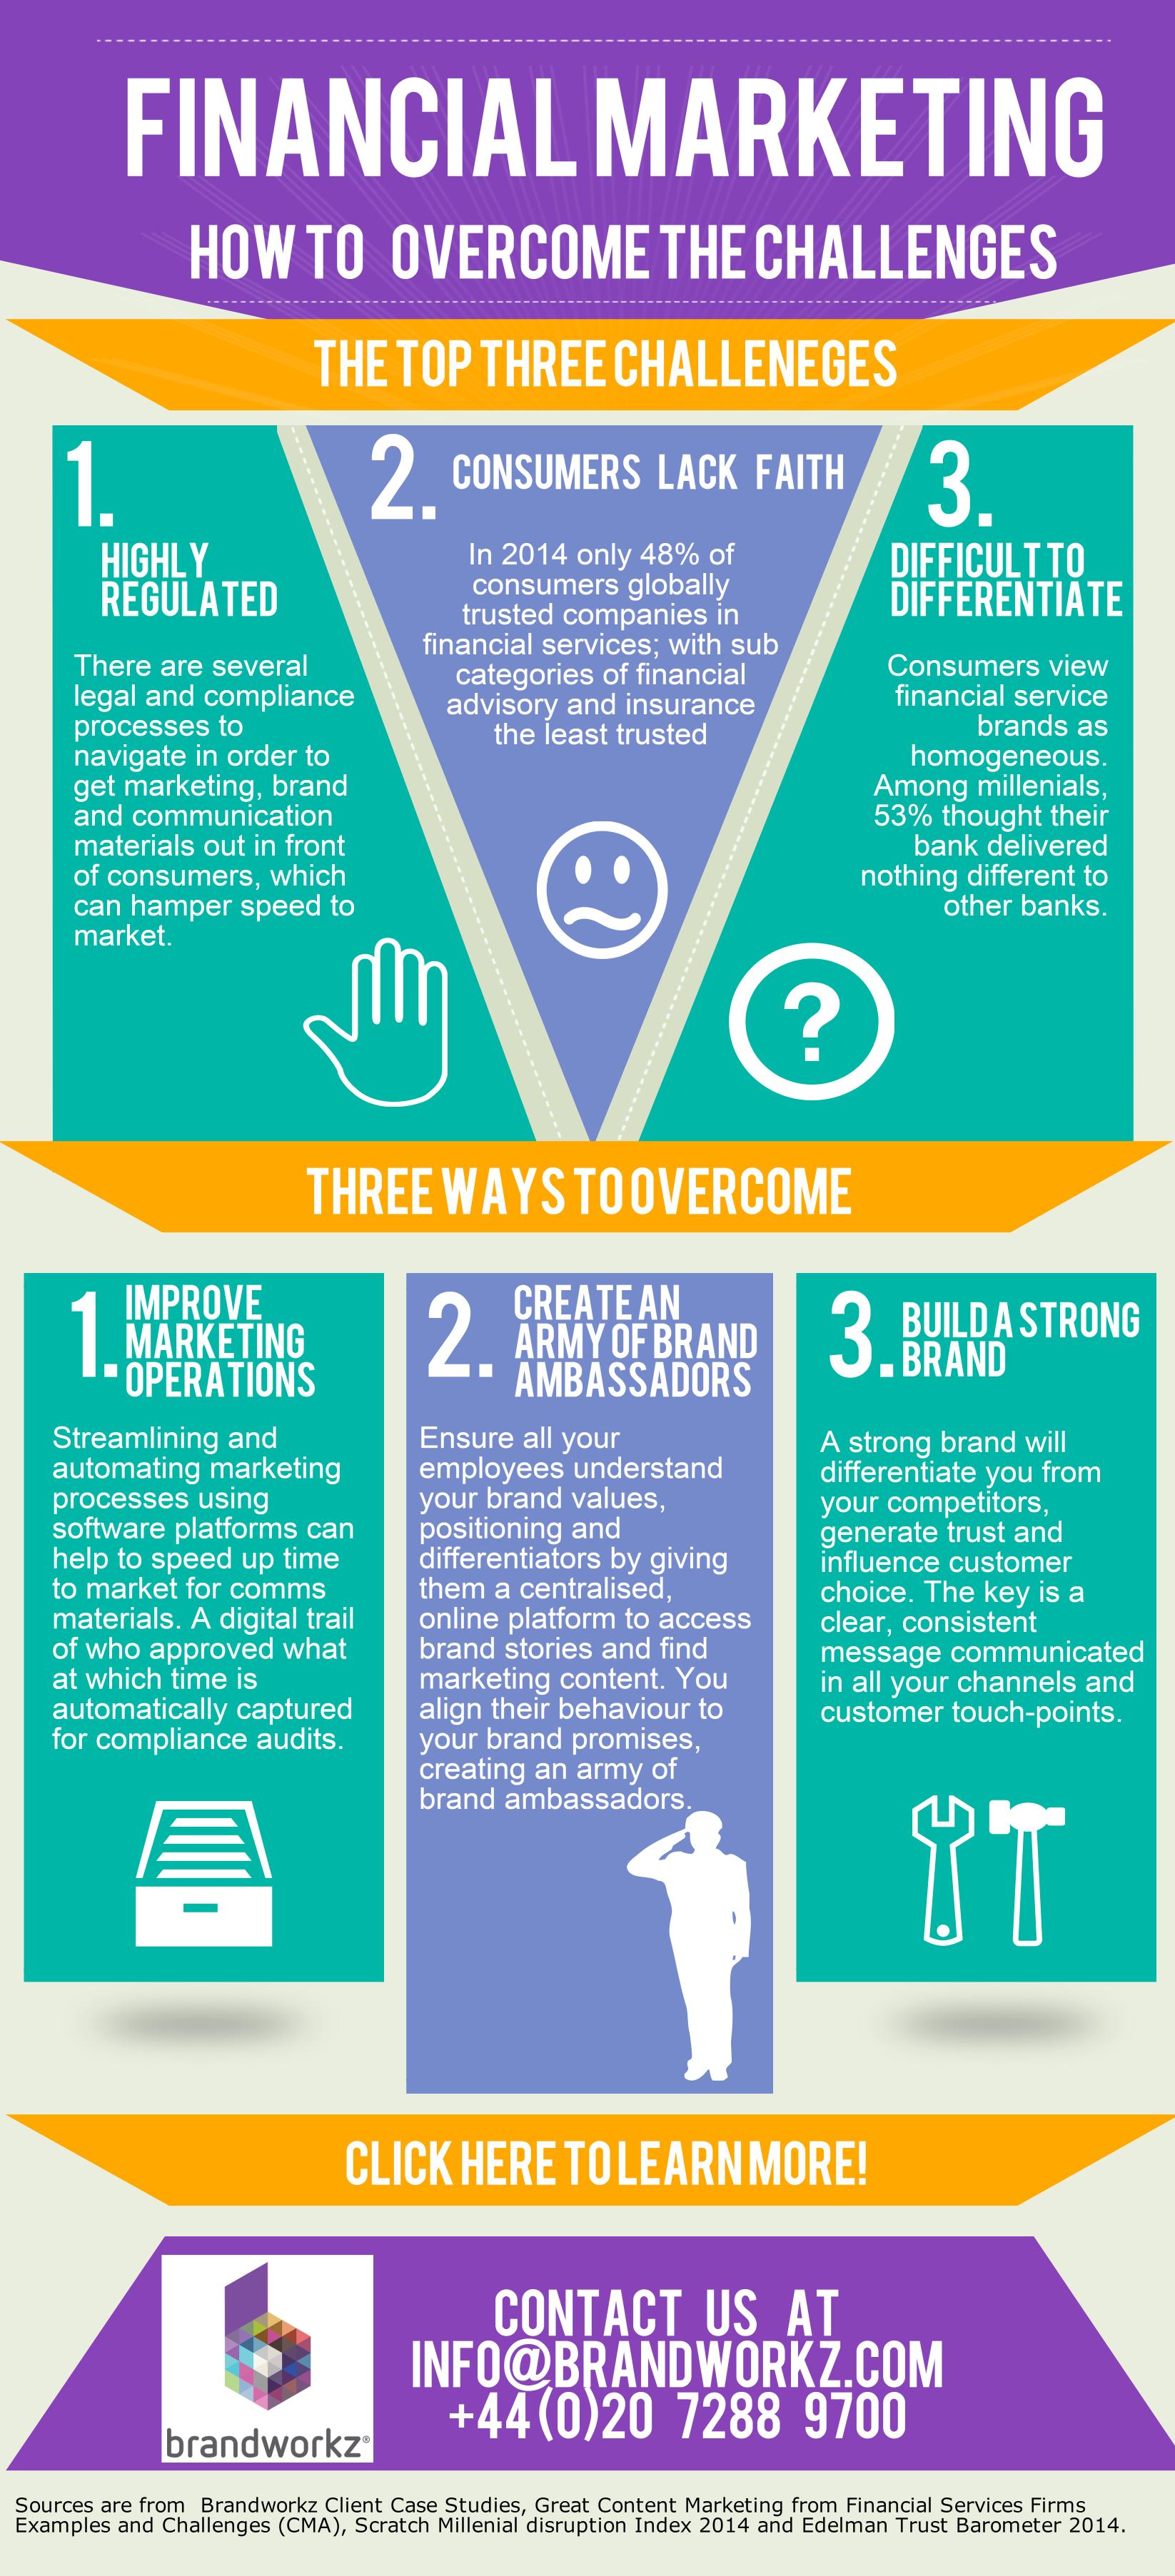 Brandworkz Financial Marketing Infographic Infographic